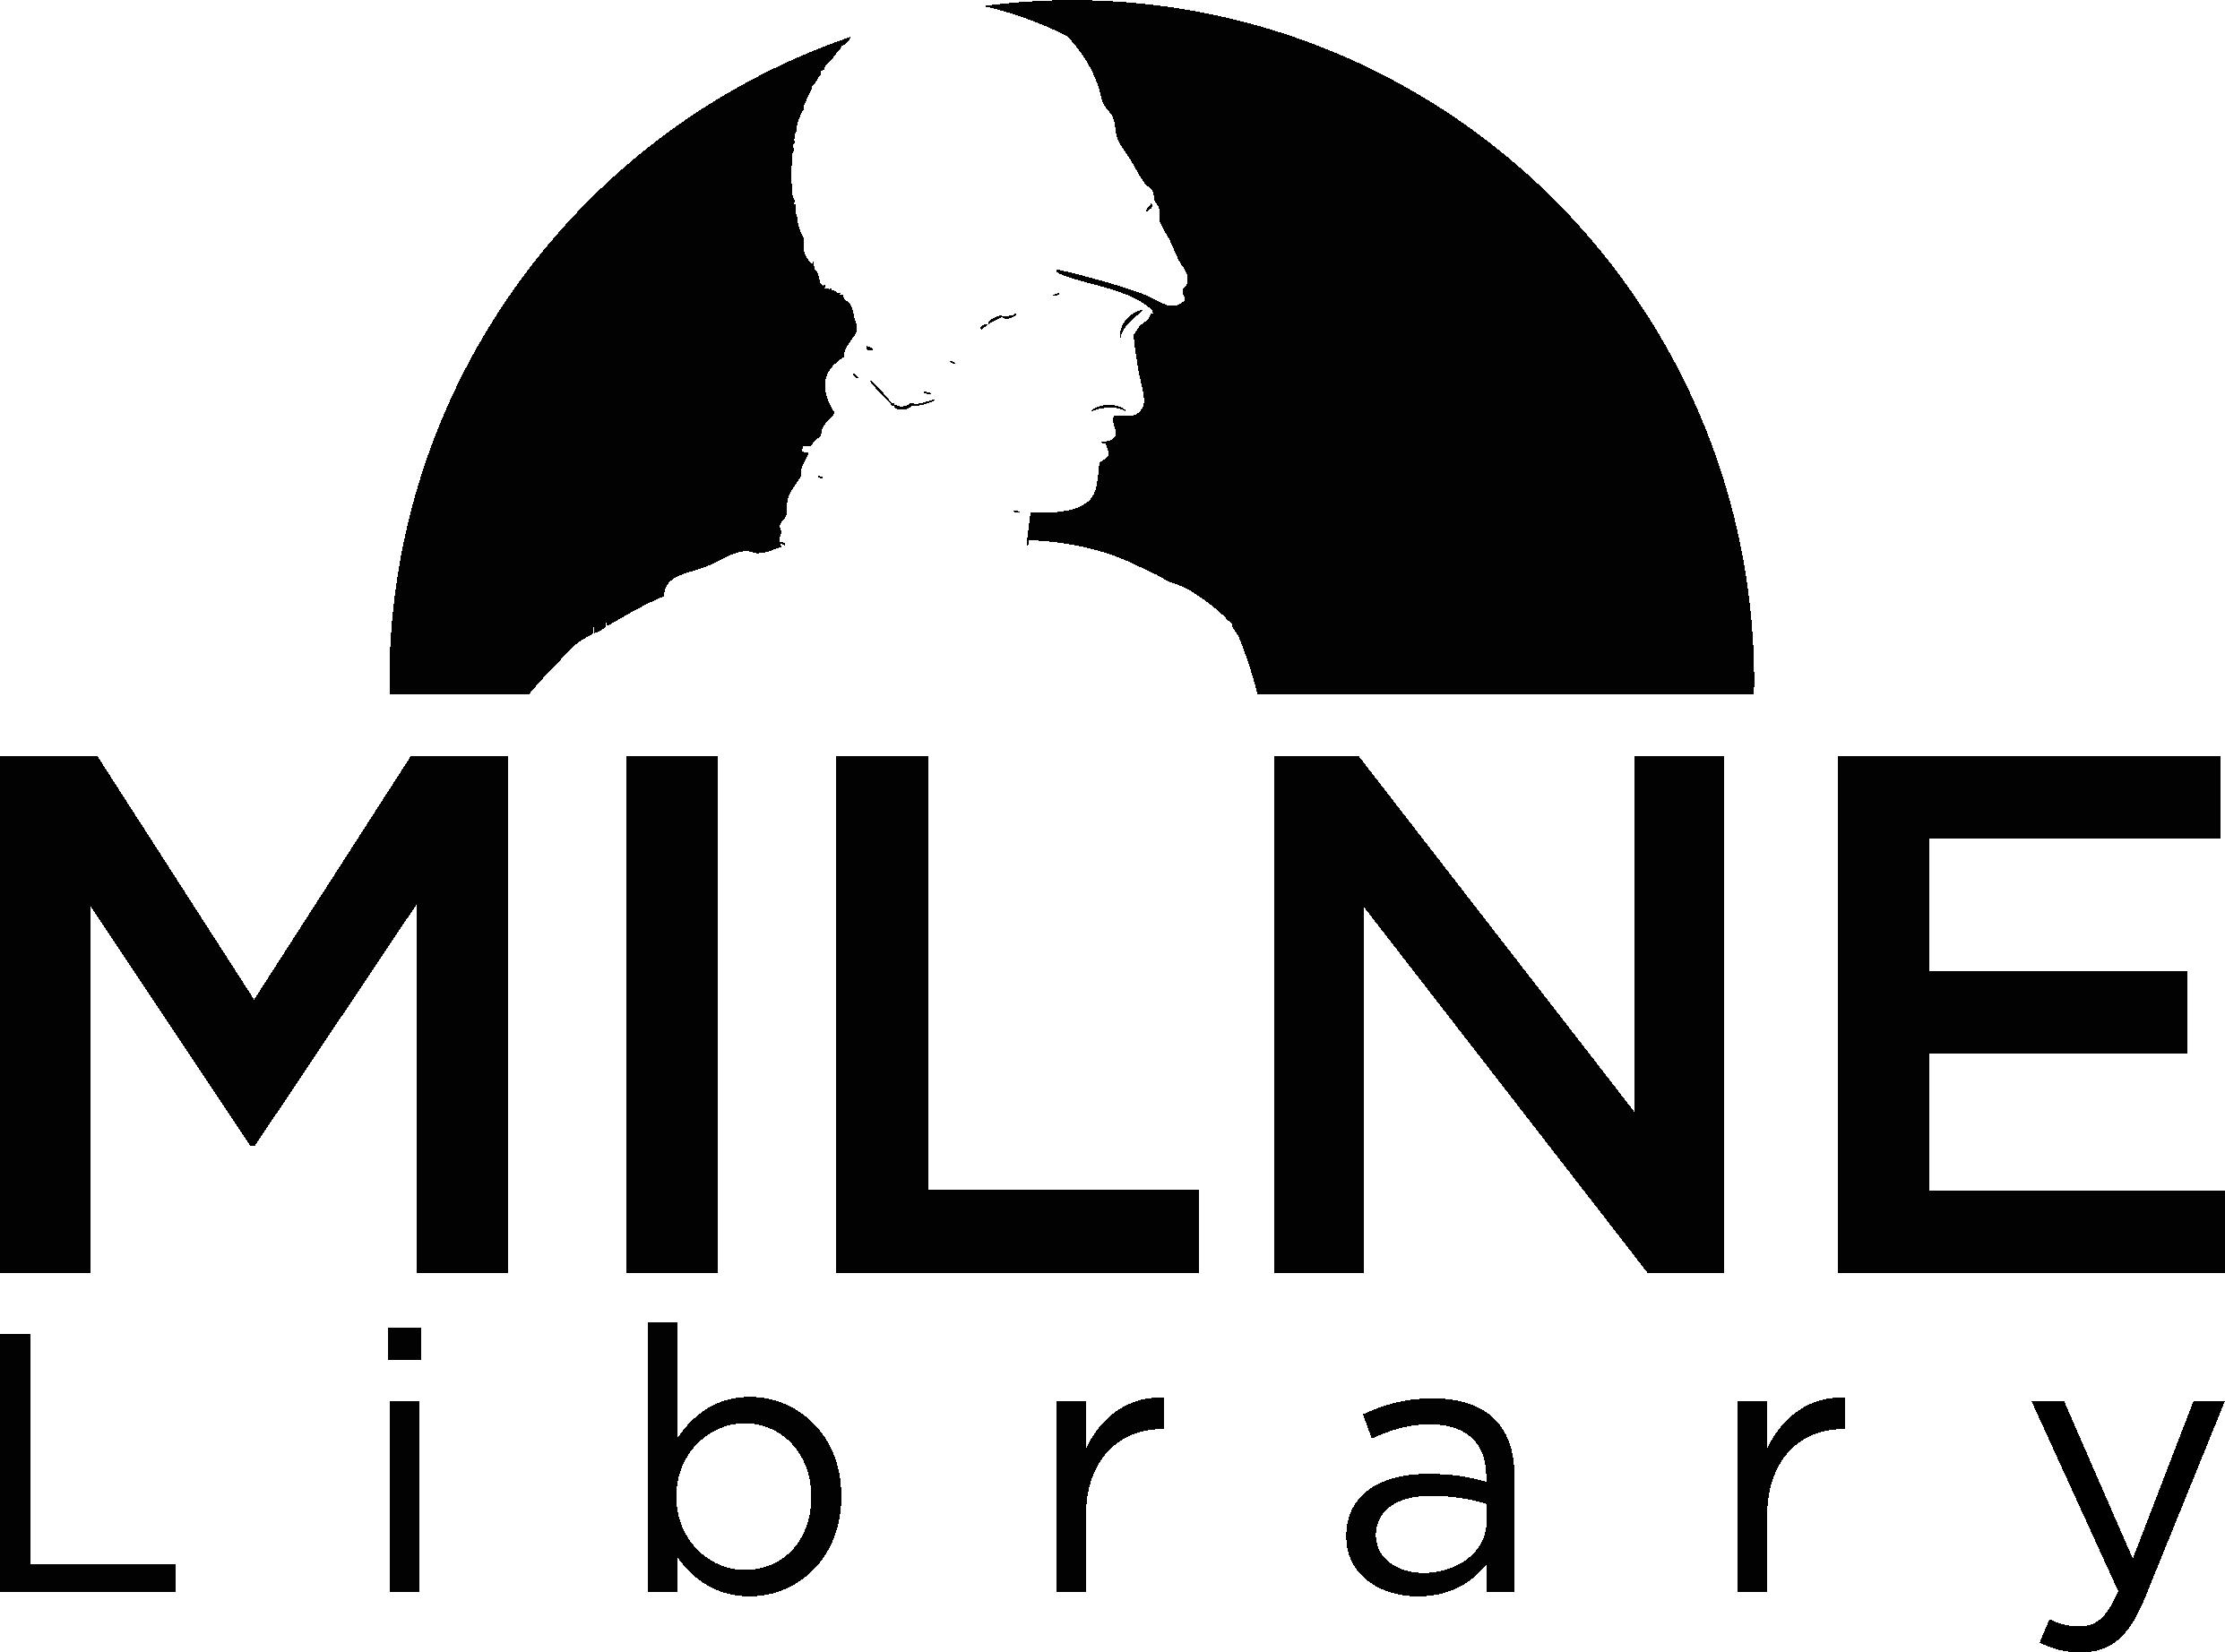 006 Autoethnography Example Essays Essay Milne Logo Black Best Sample Pdf Examples Full